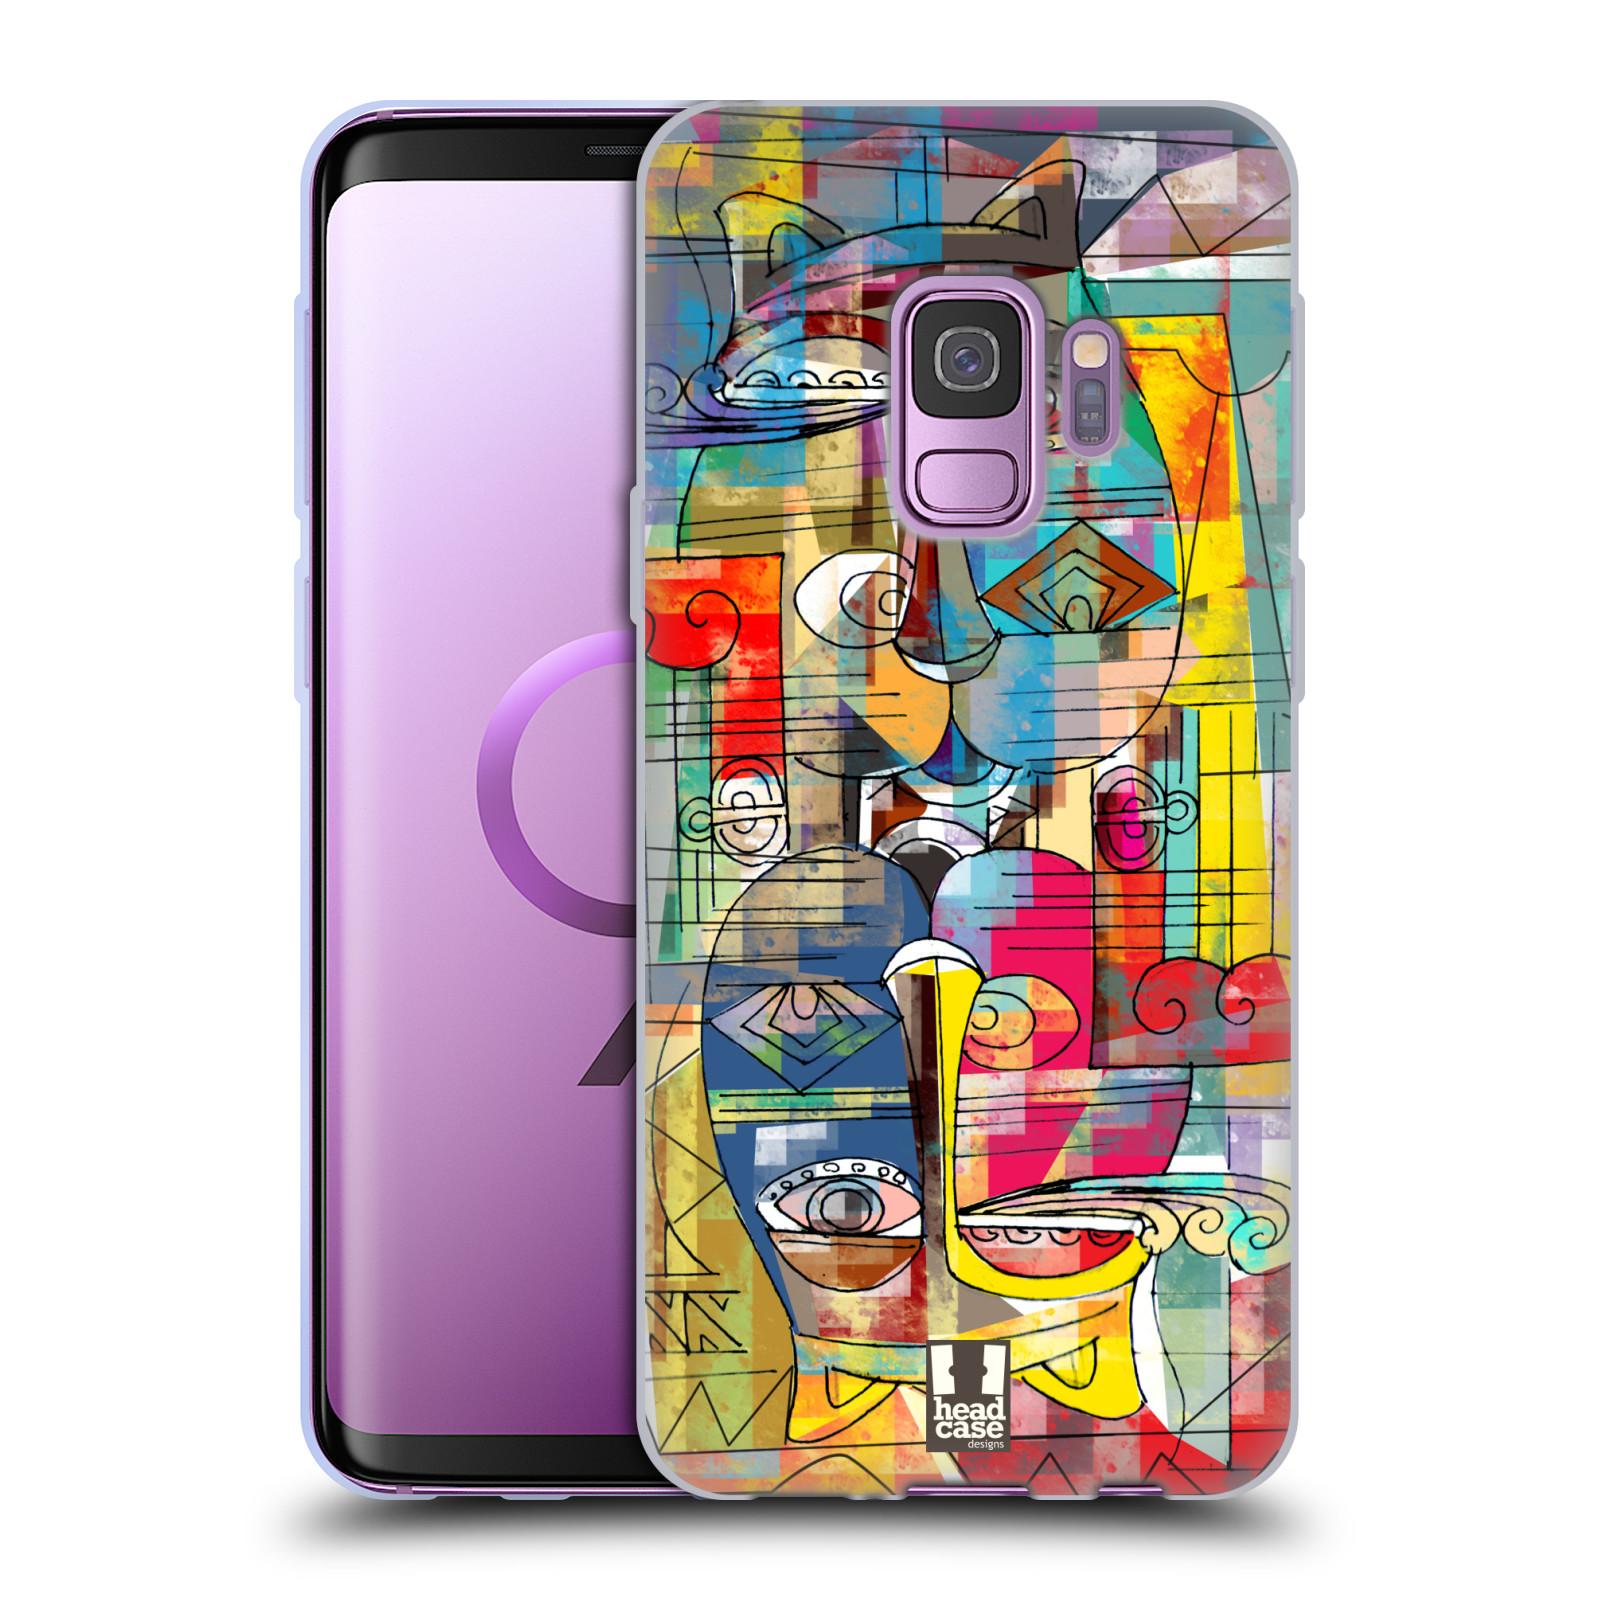 Silikonové pouzdro na mobil Samsung Galaxy S9 - Head Case - AZTEC MANX